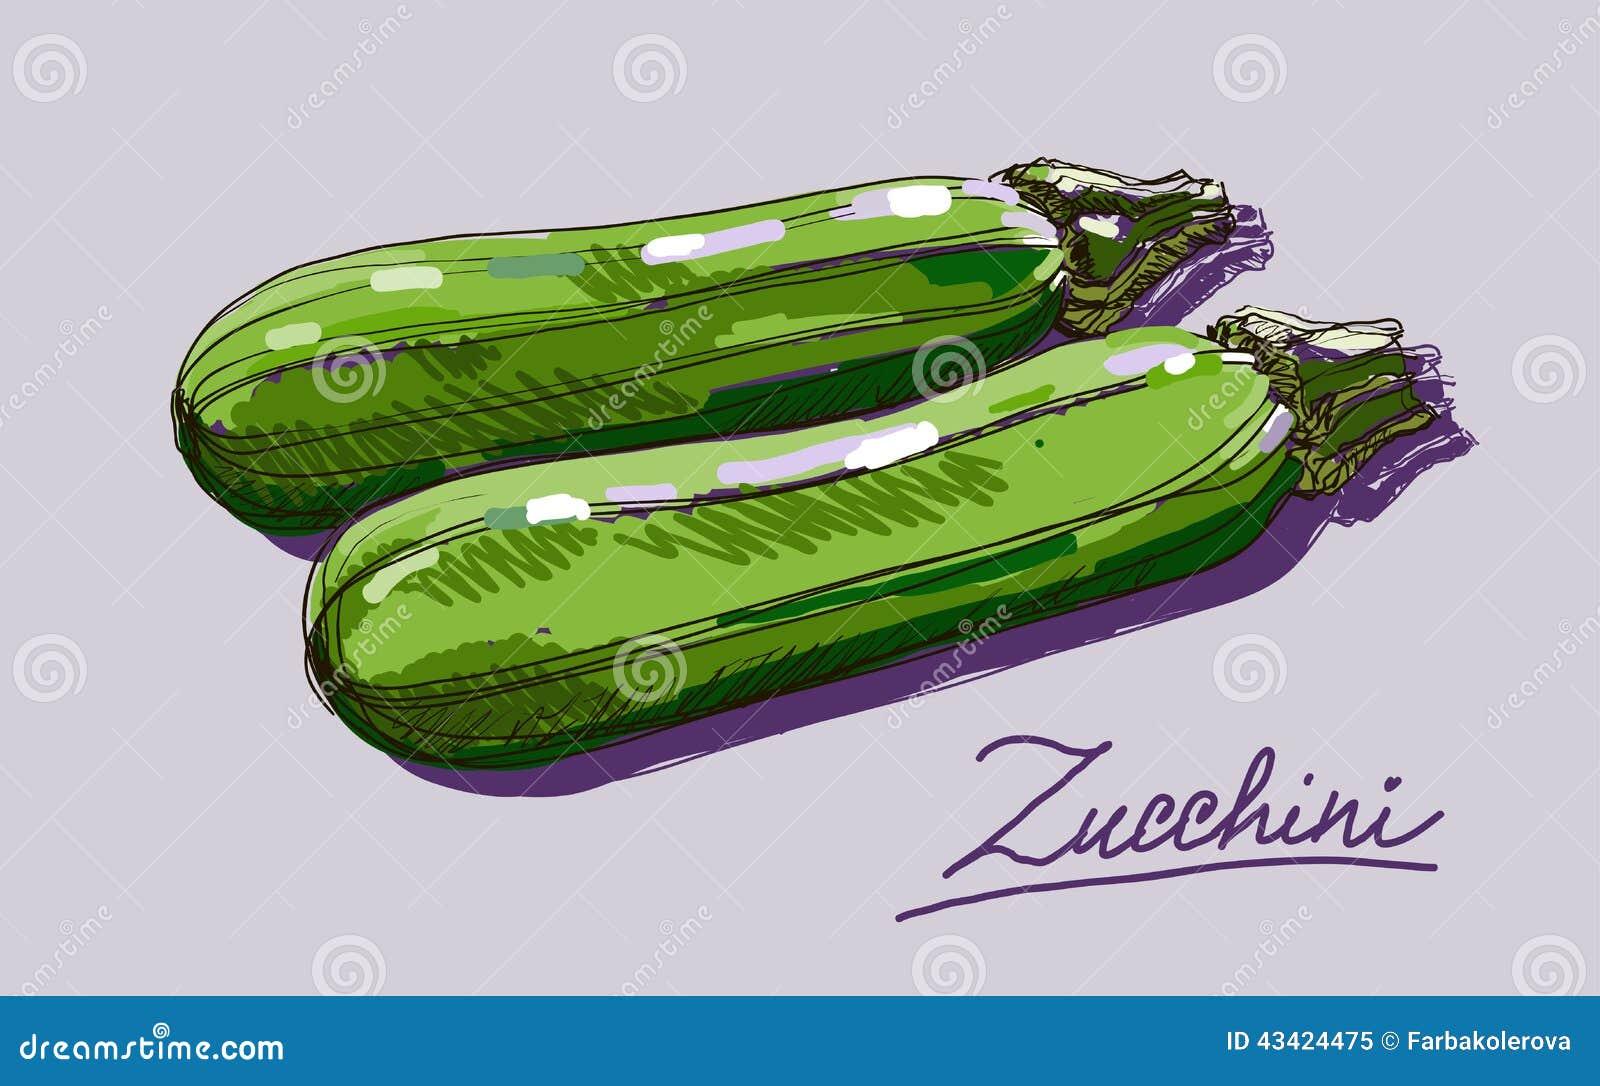 how to make zucchini grow big